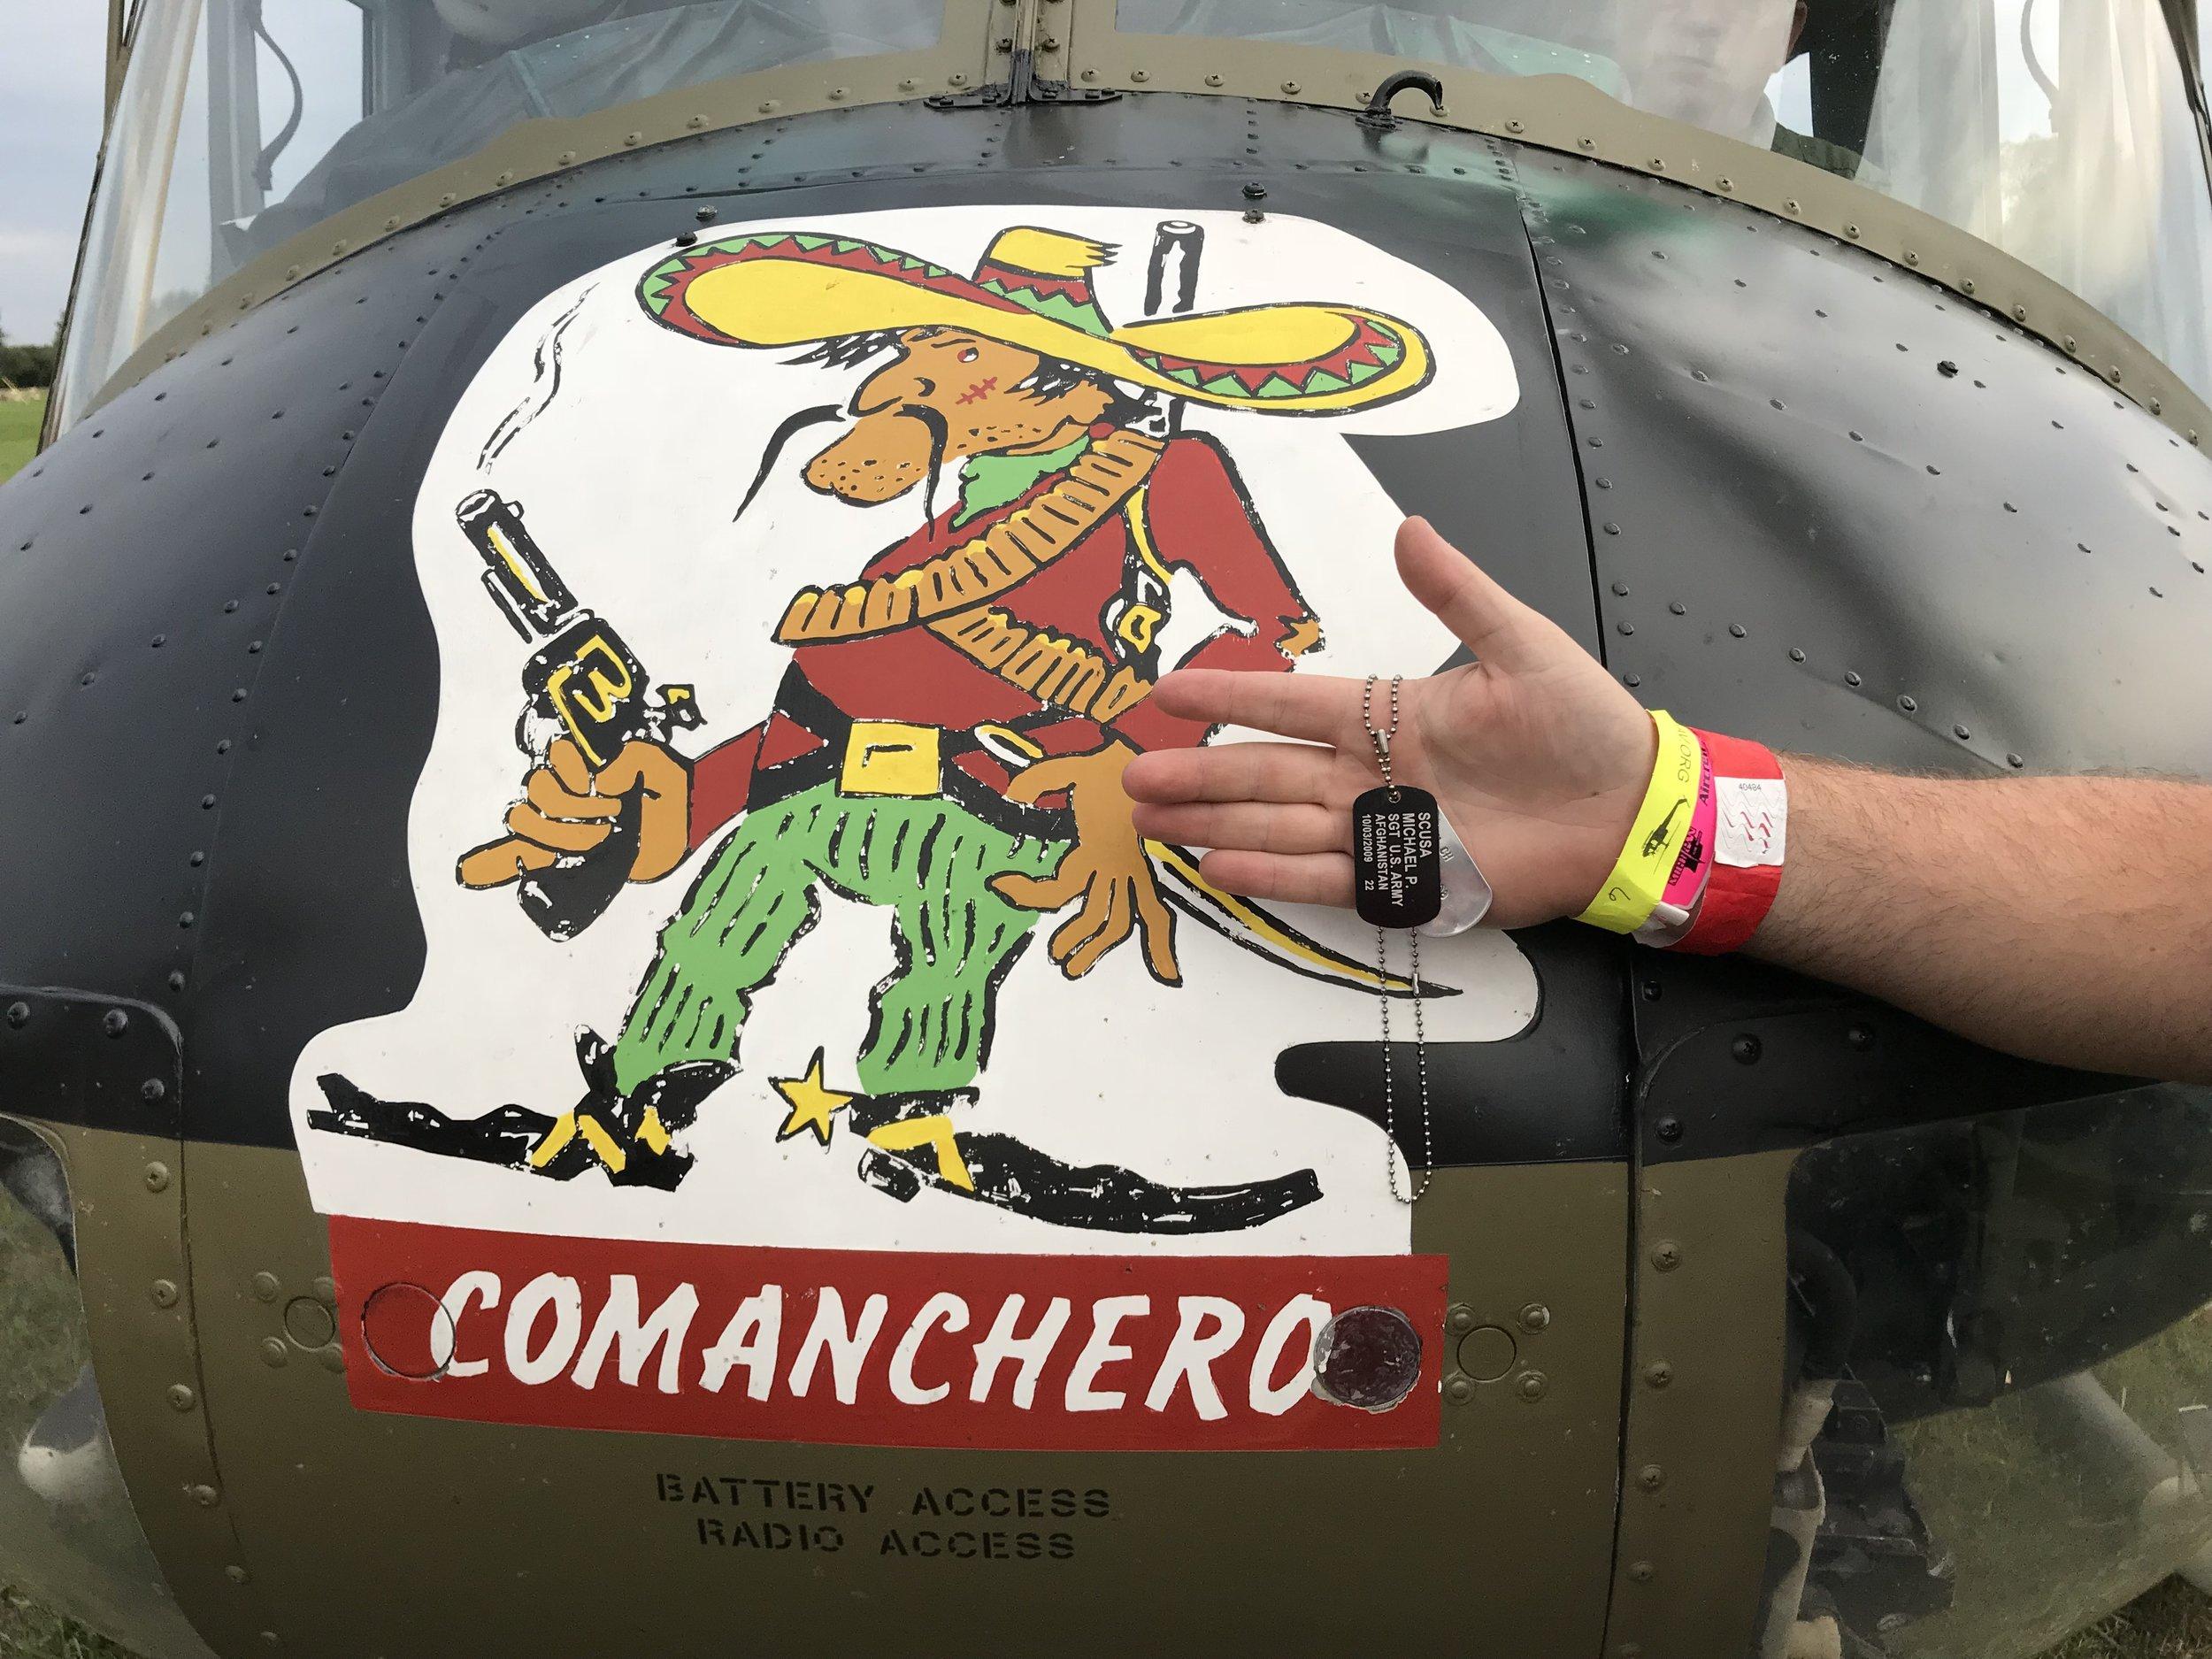 Photo courtesy of Army Aviation Heritage Foundation.